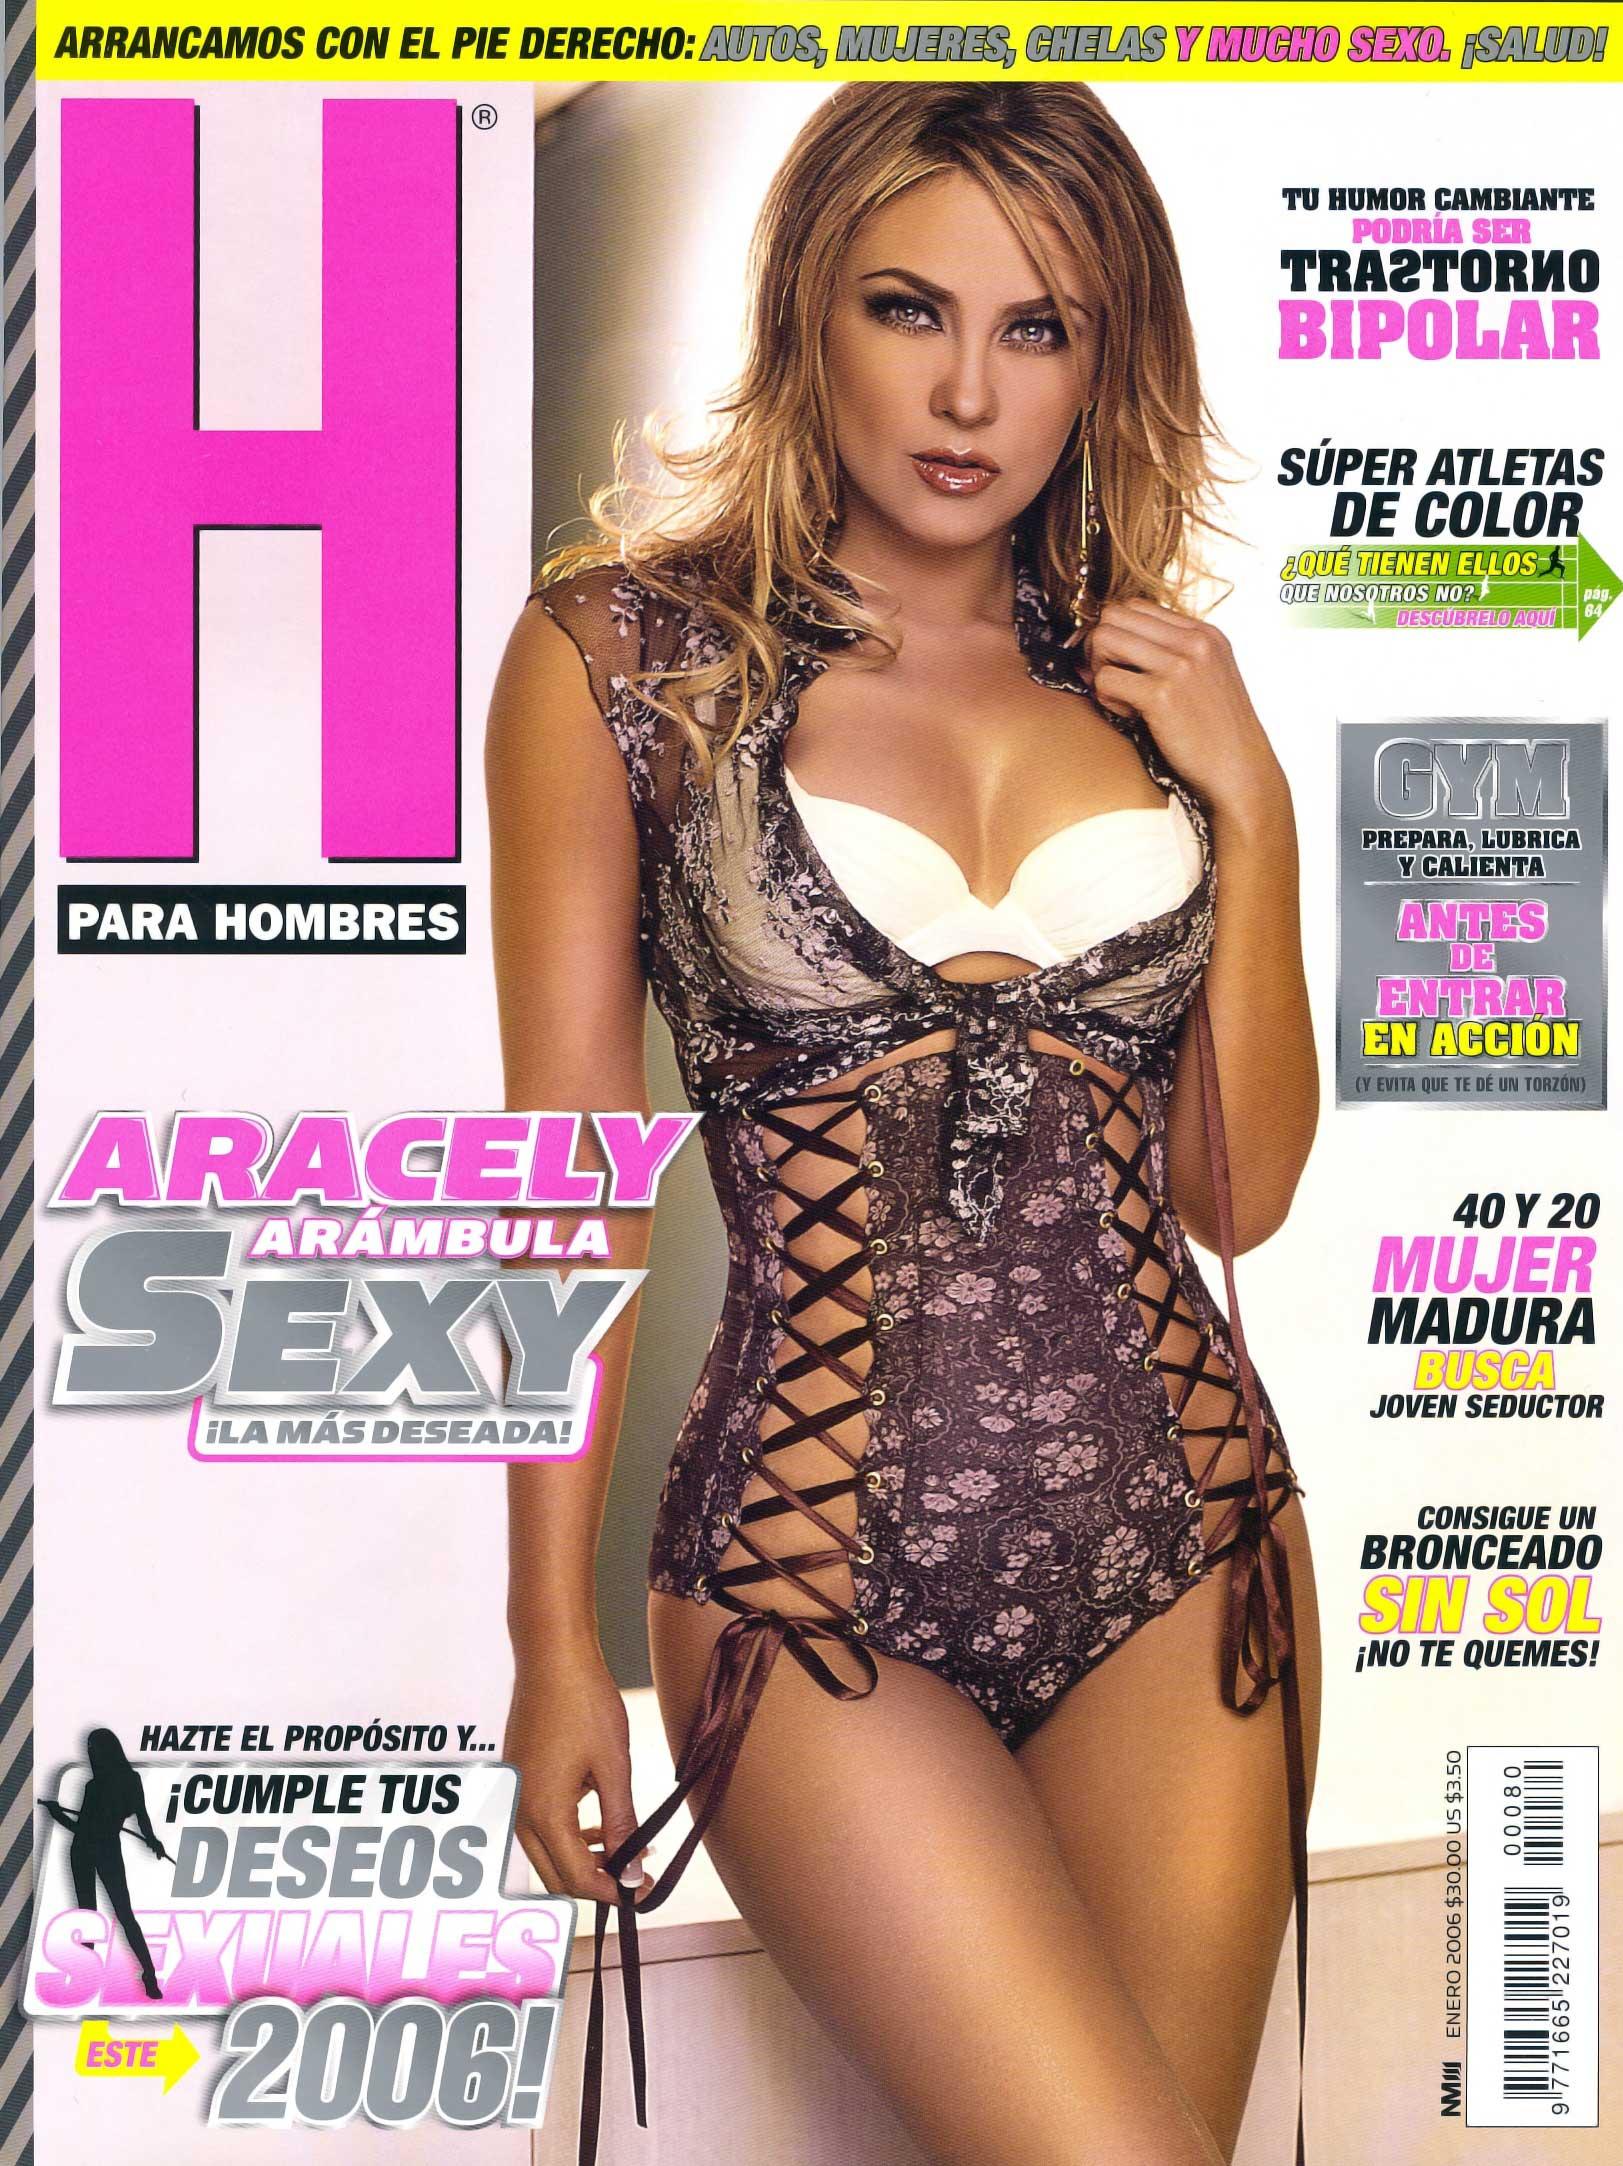 Revista H | ANTOLOGIA DE BELLEZAS